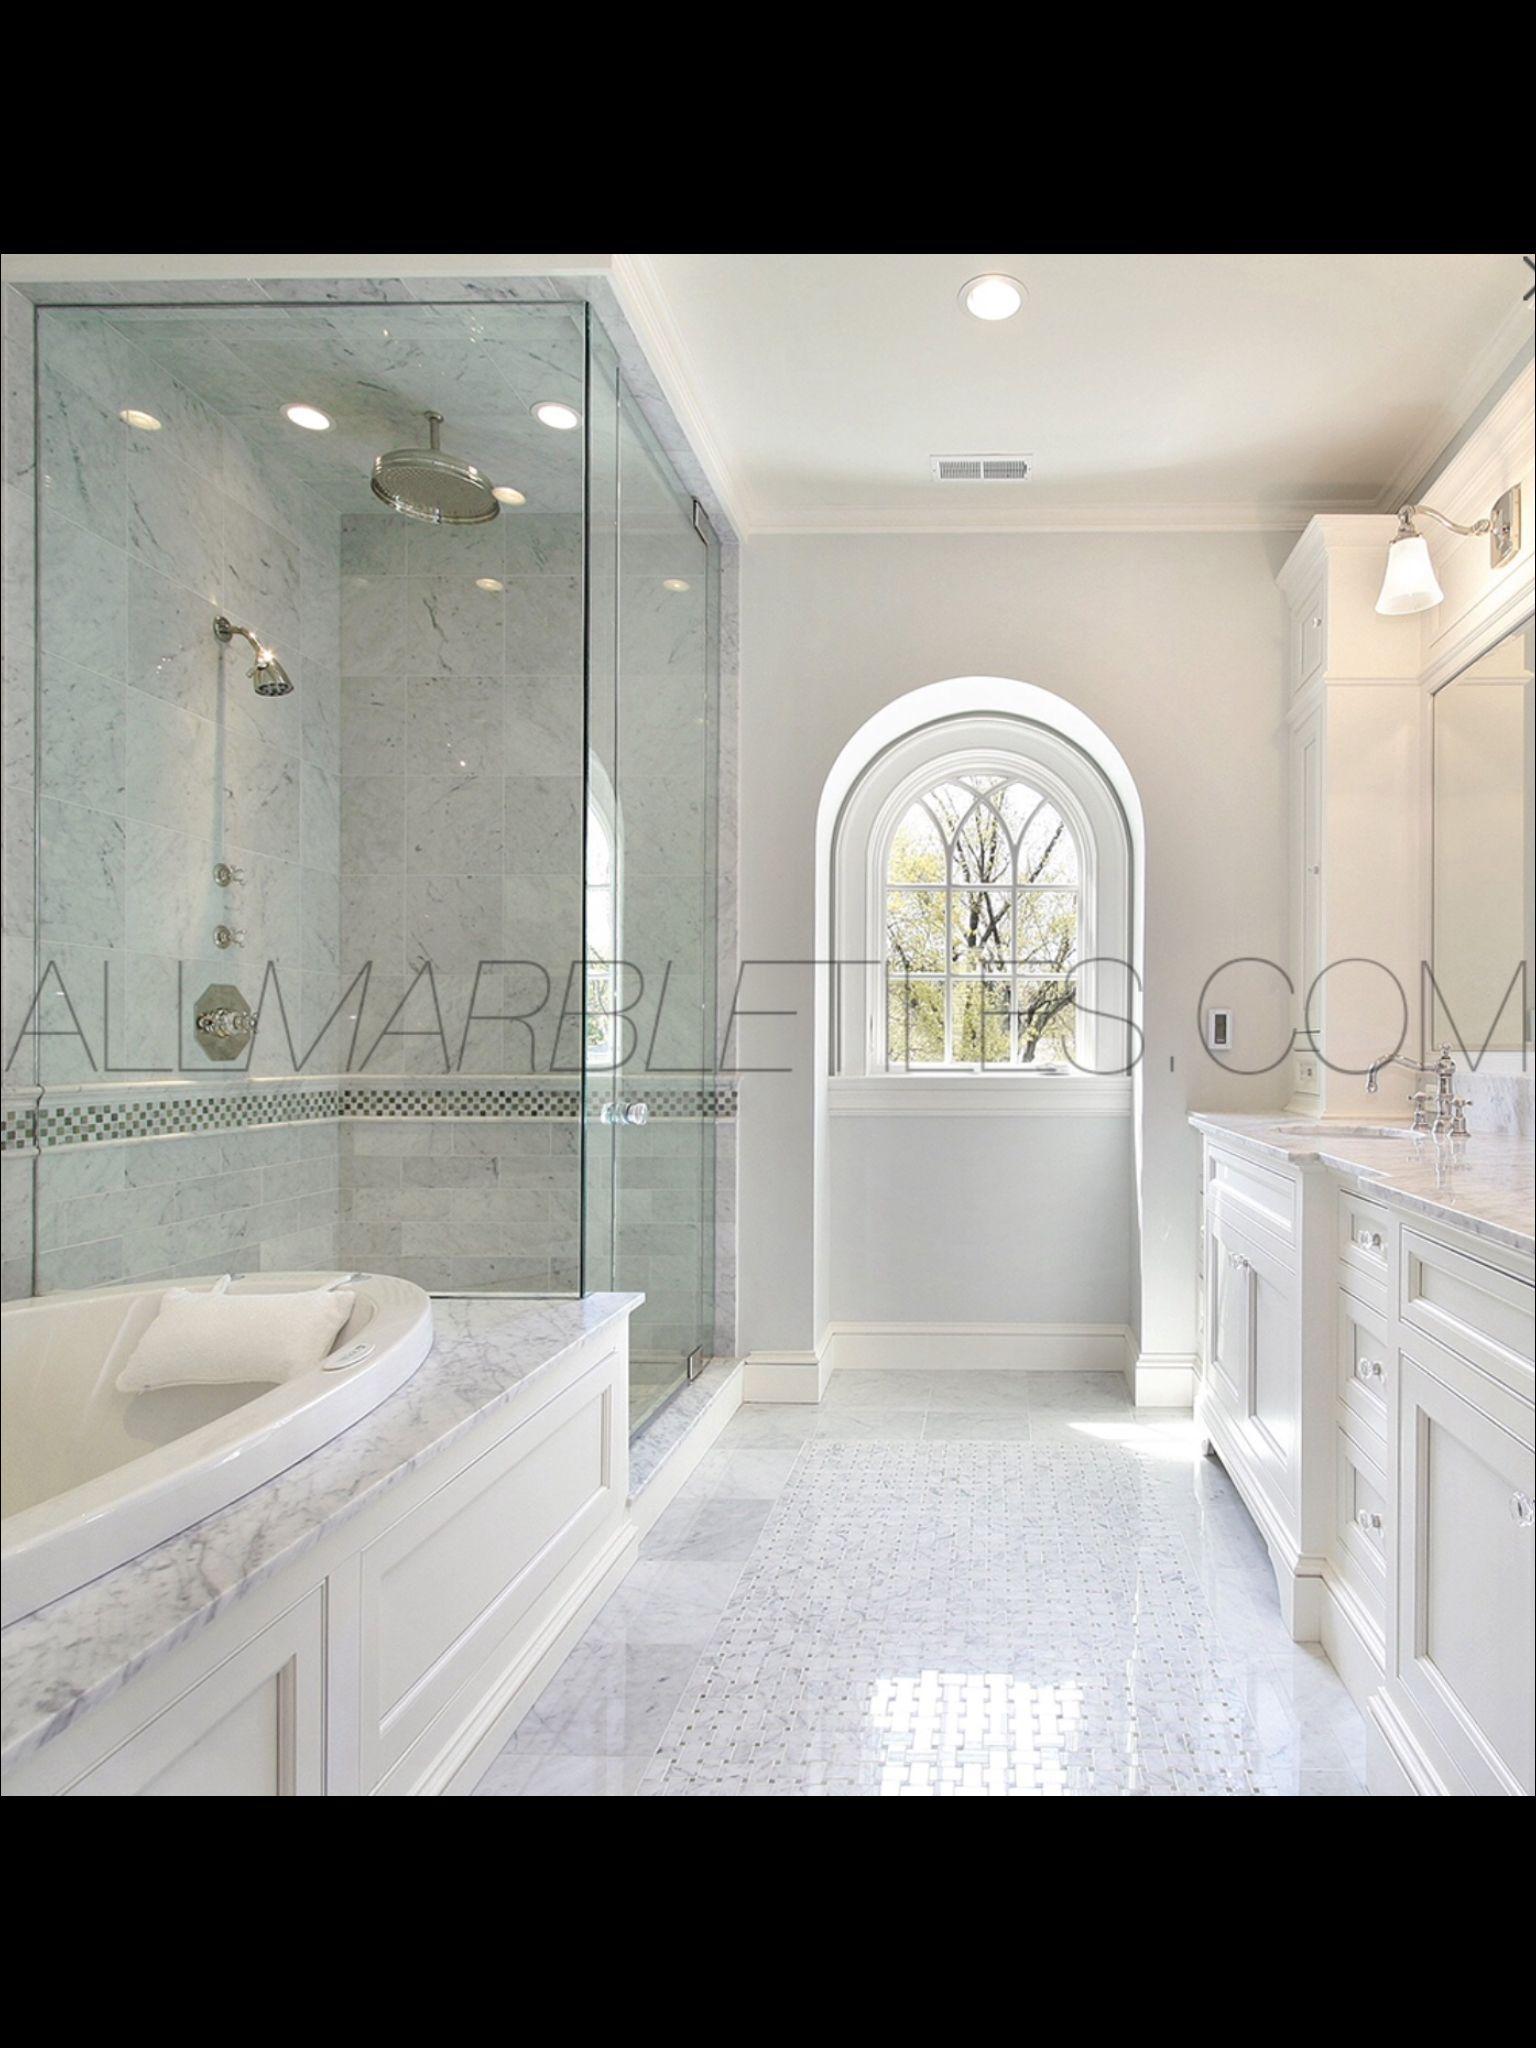 Beautiful | Master Bathroom Ideas | Pinterest | Master bathrooms